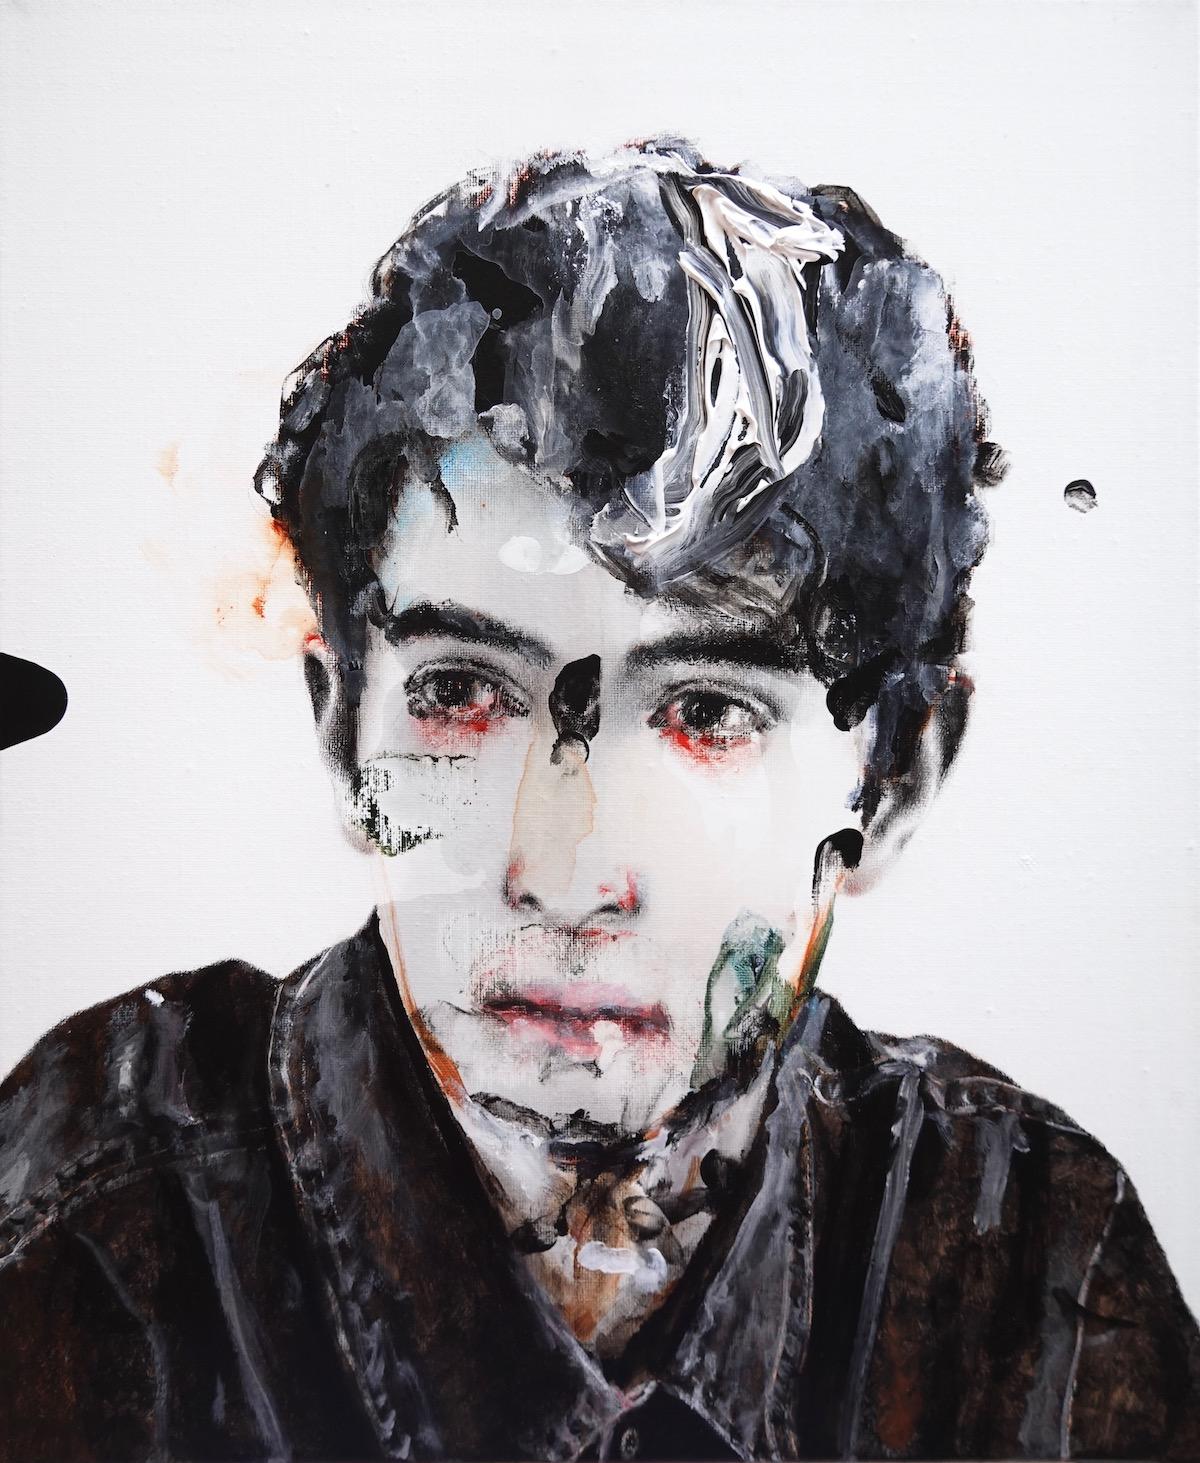 antoine cordet canvas toile peinture painting portrait art artist artiste peintre acrylic oil nine lives